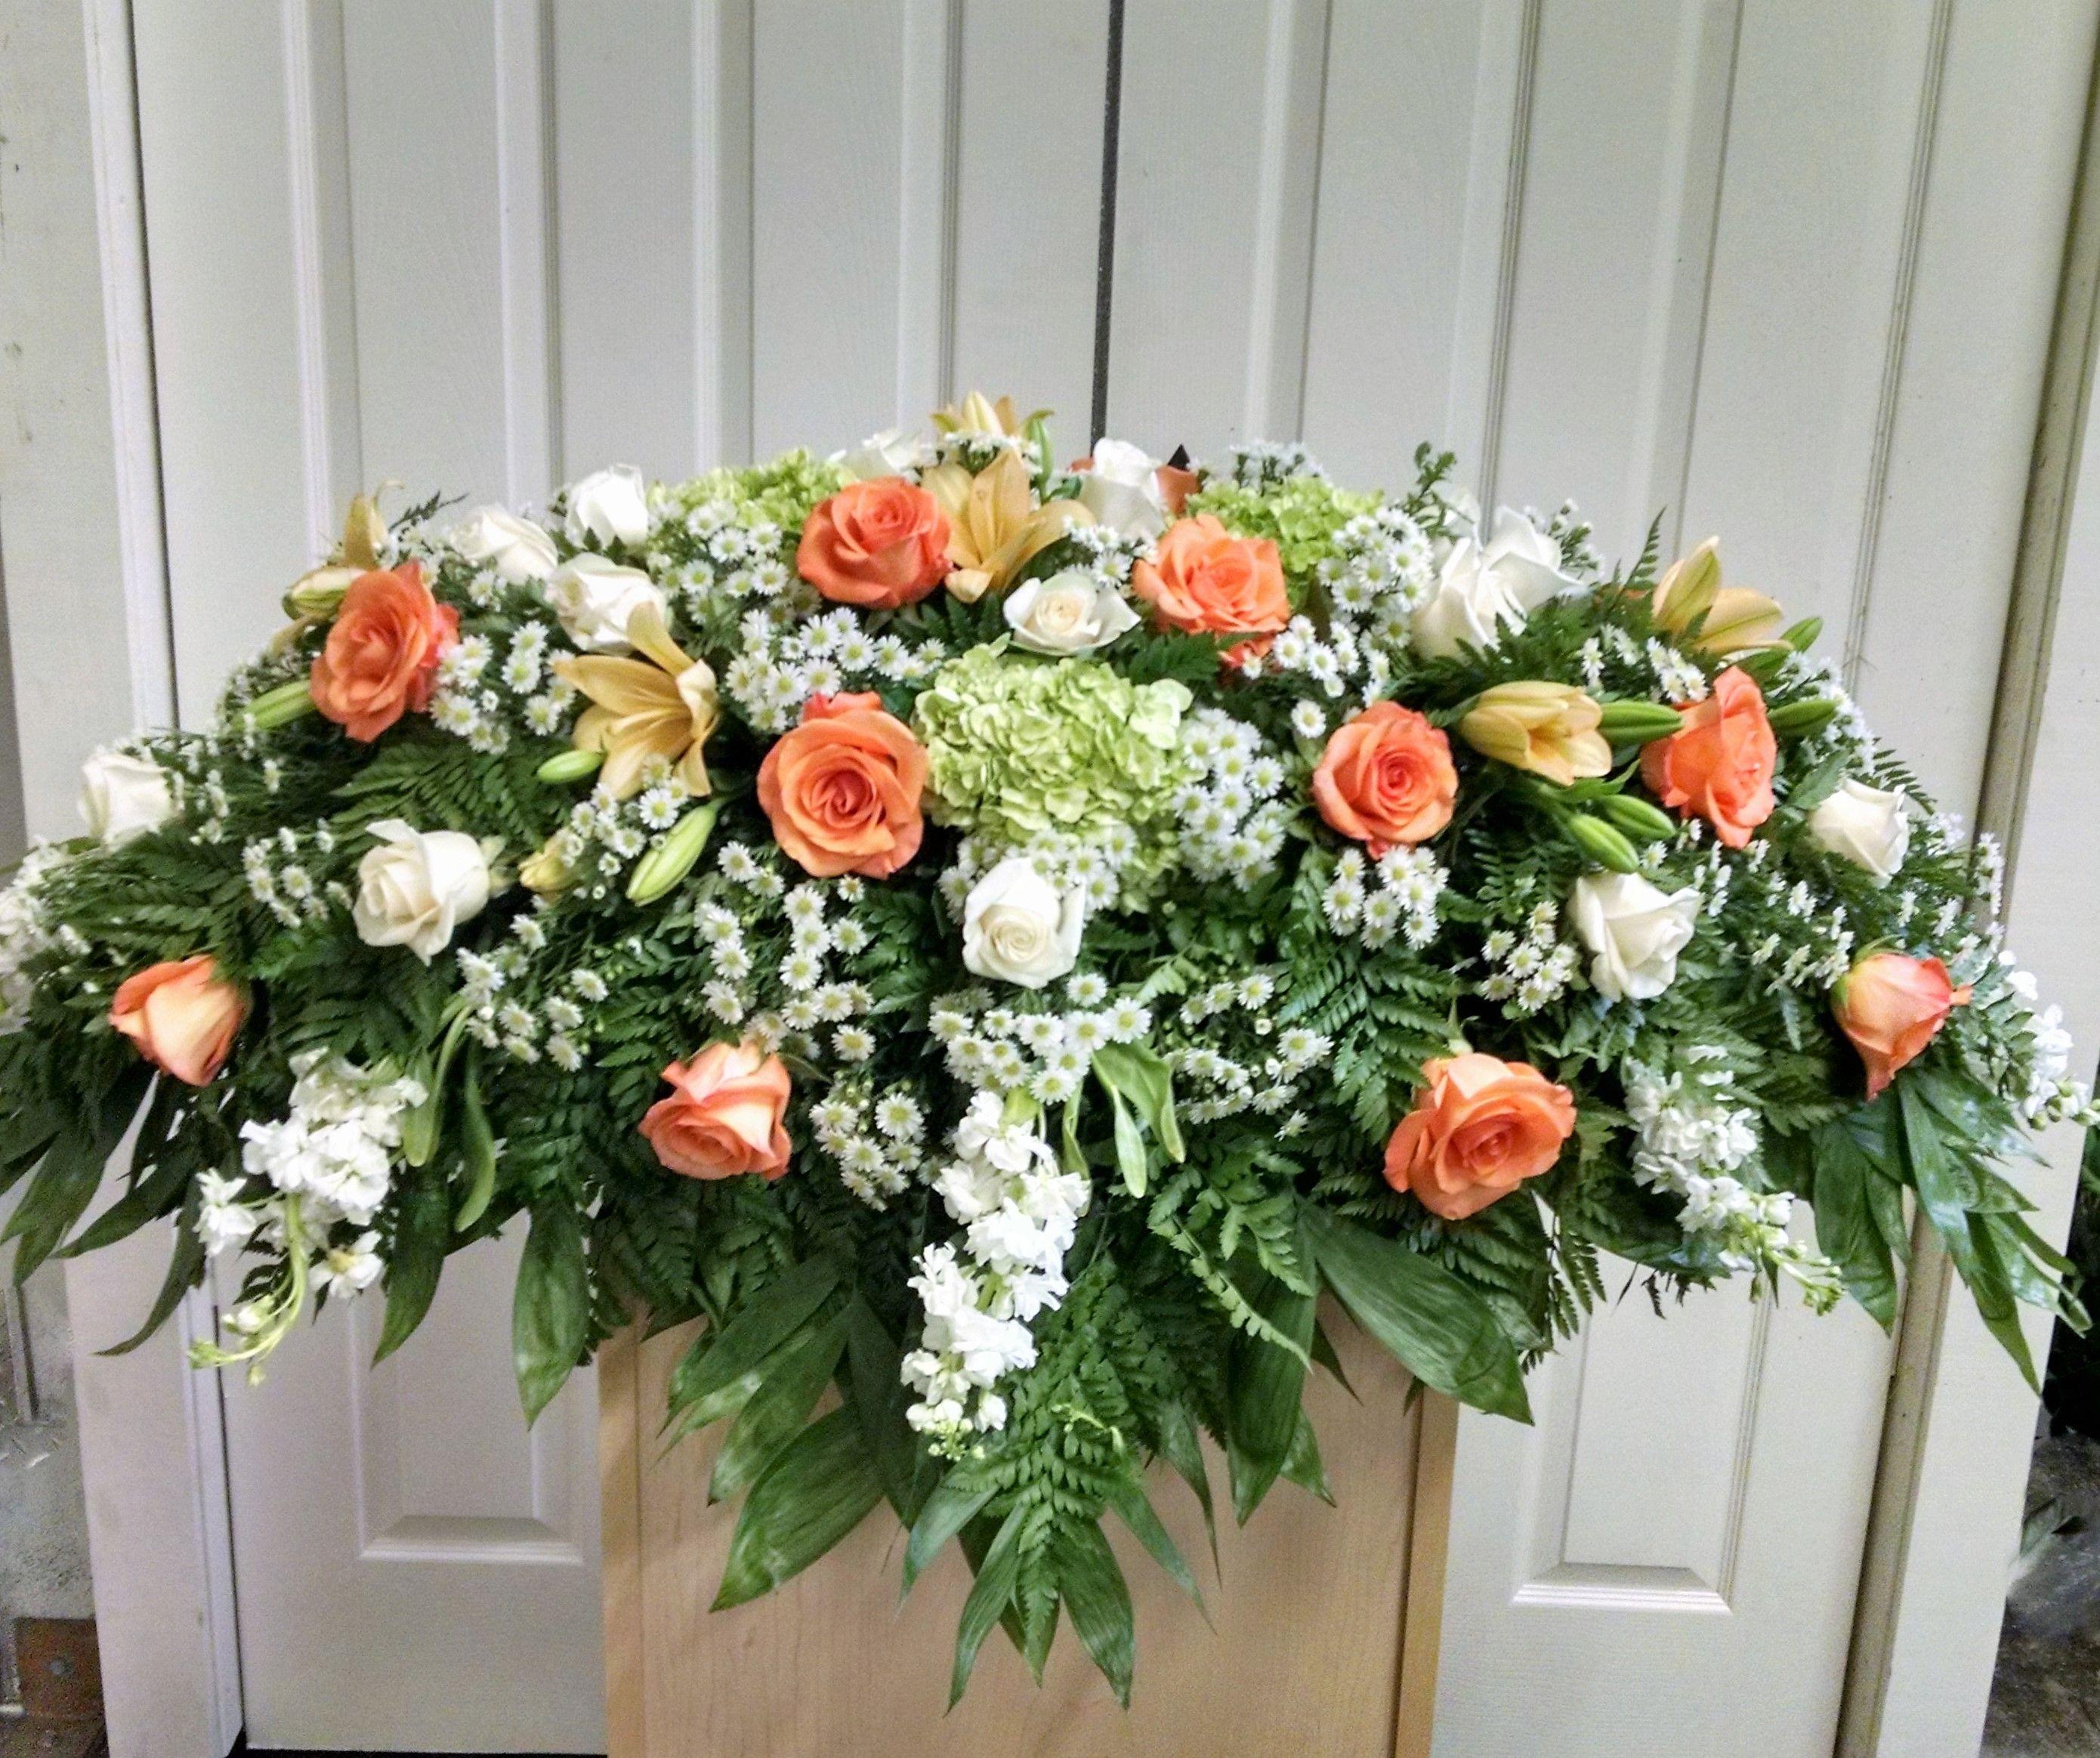 Pin by eric morgan on funeral casket flowers in 2018 pinterest casket flowers funeral caskets flower delivery casket sprays memorial flowers order izmirmasajfo